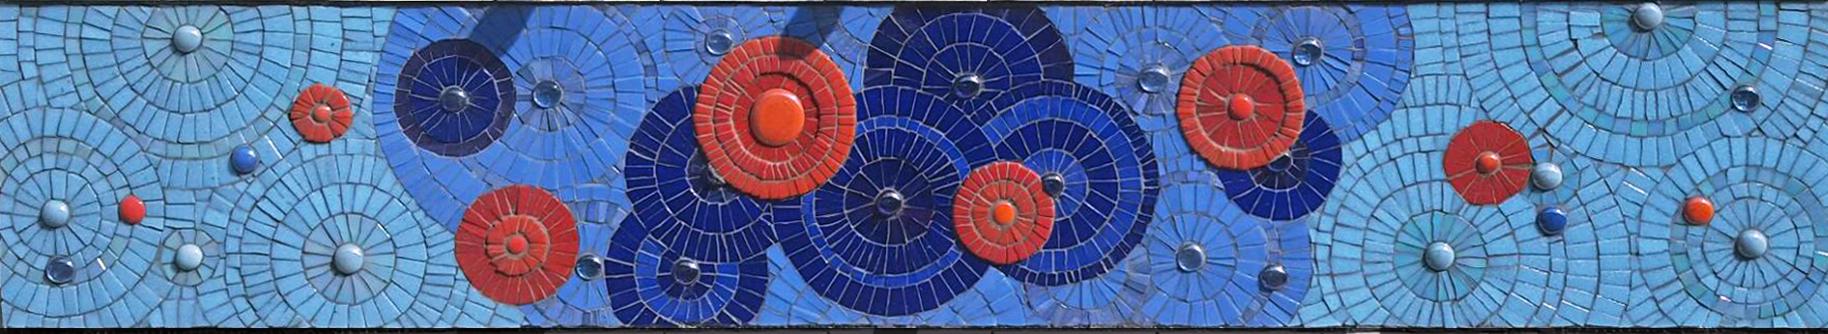 Pool Shower Mosaic